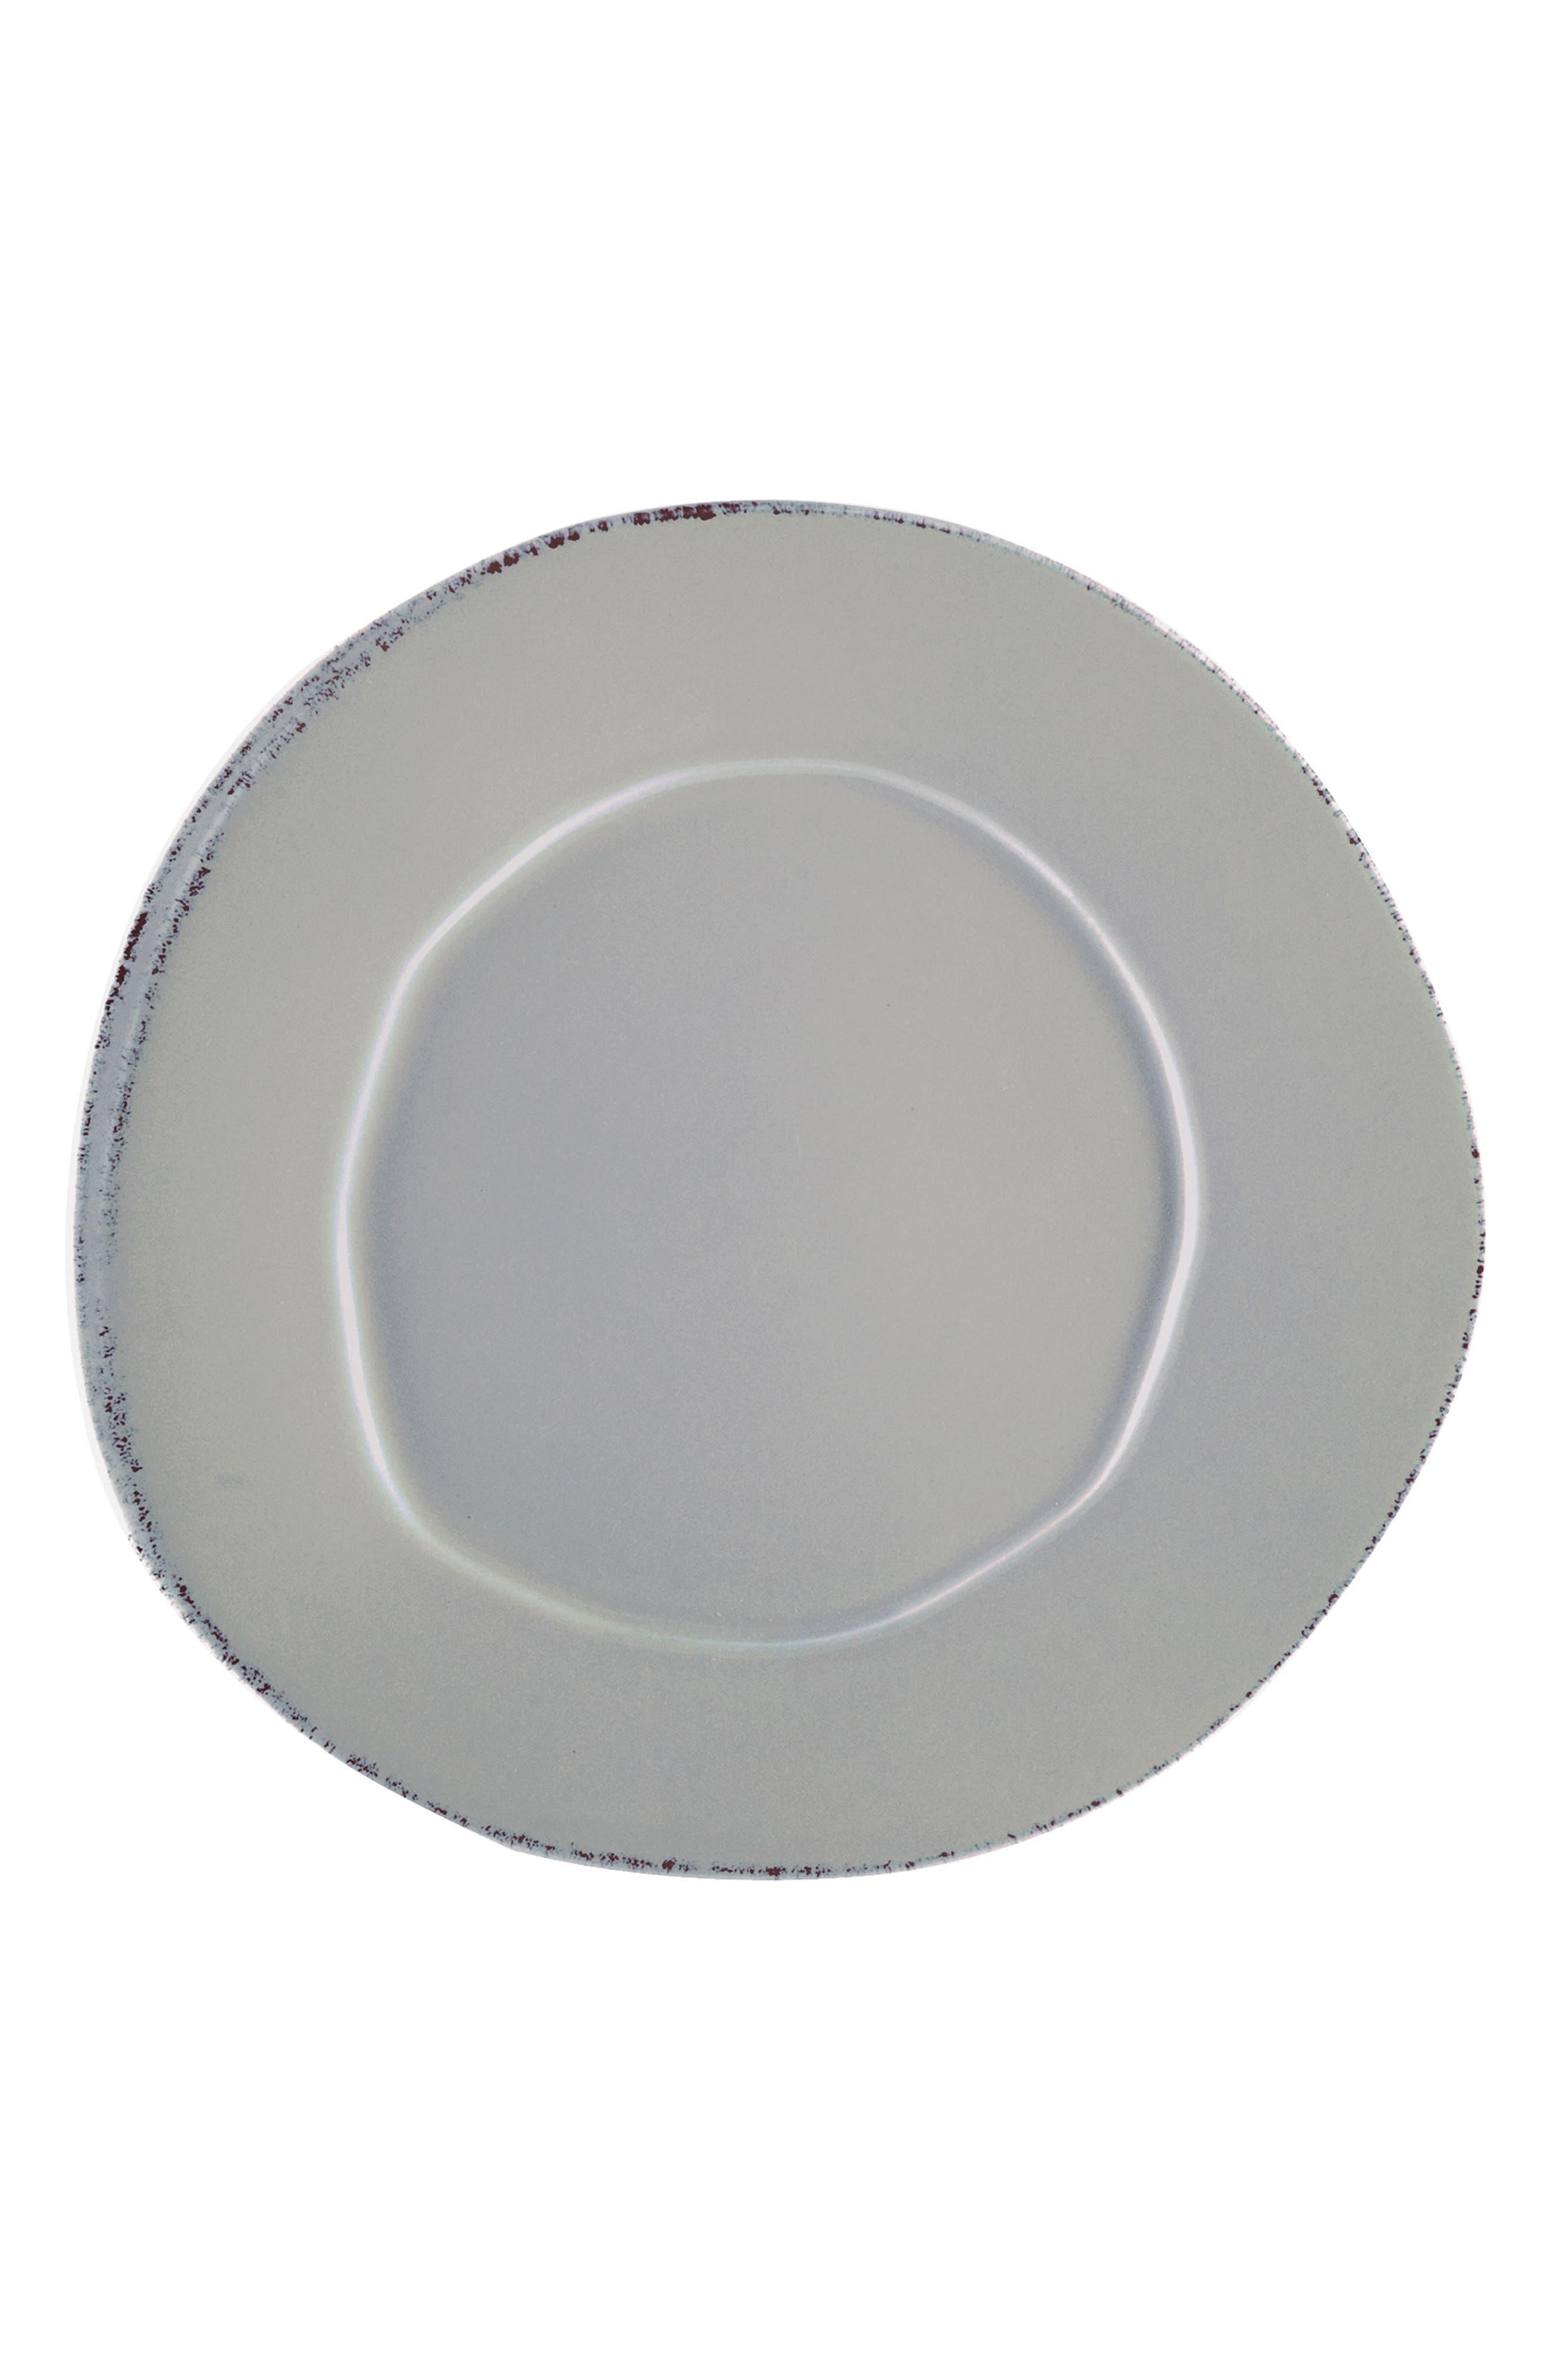 Lastra Stoneware Dinner Plate,                             Main thumbnail 1, color,                             Gray